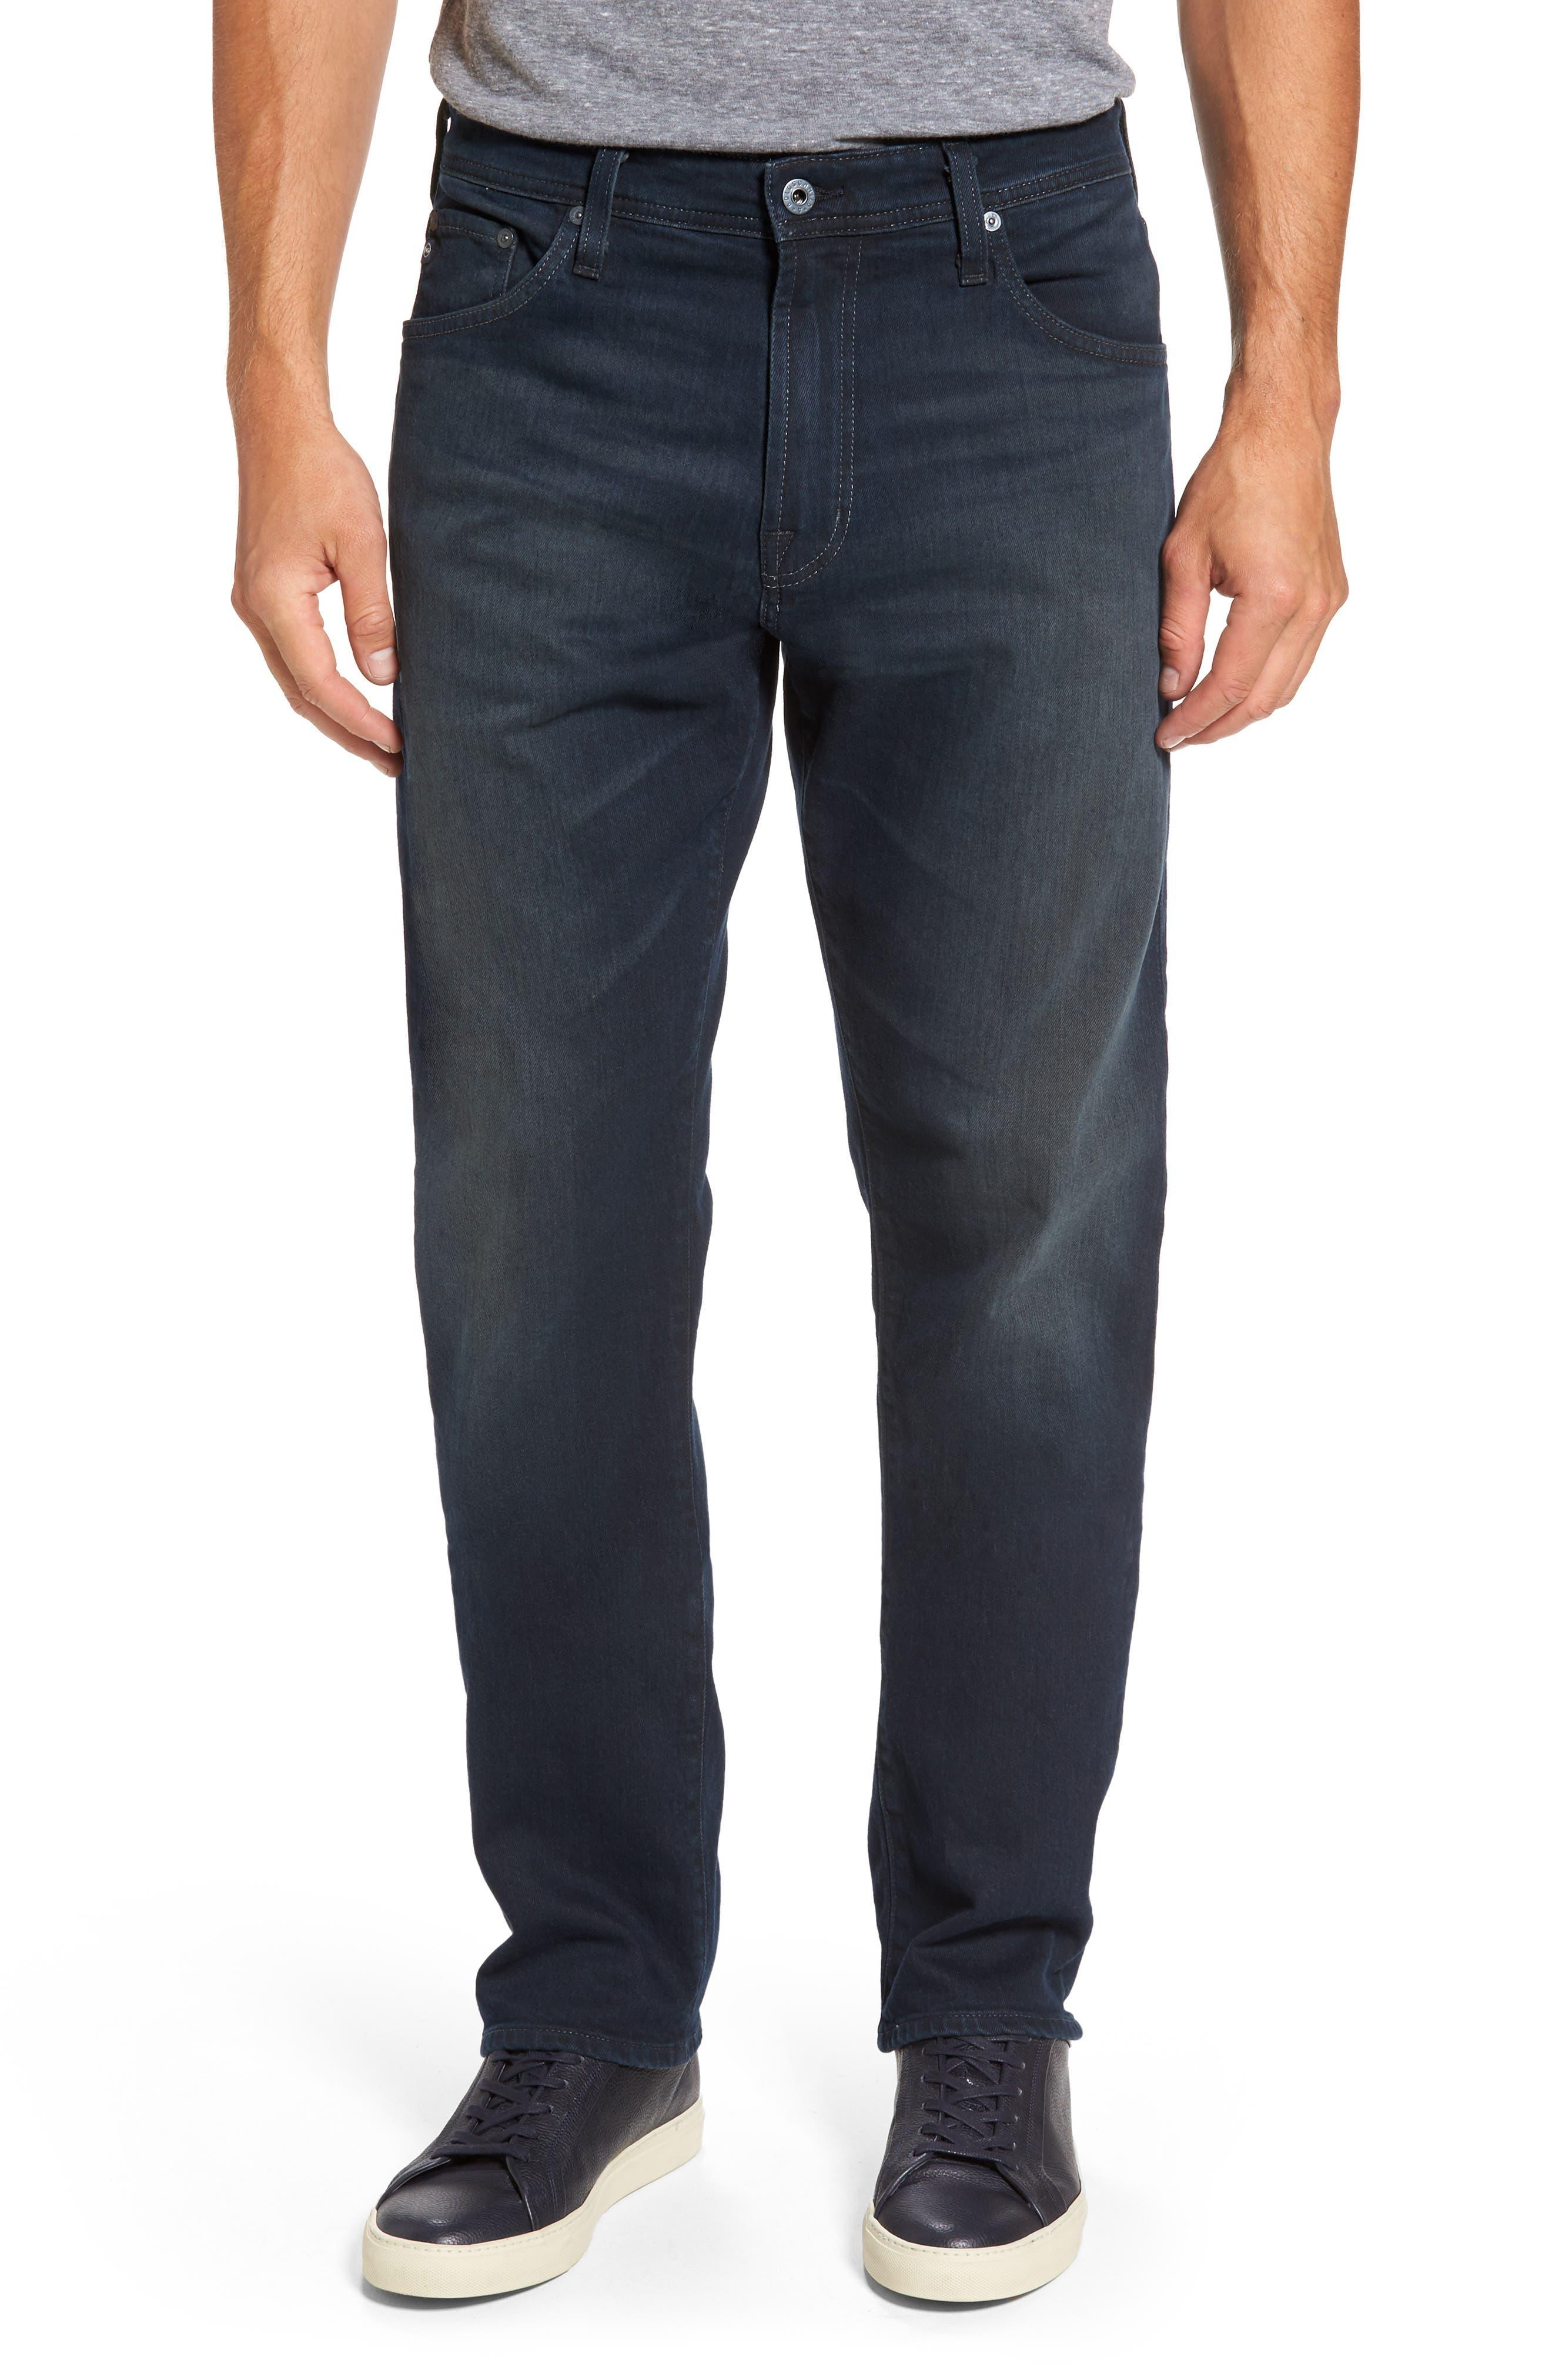 Alternate Image 1 Selected - AG Ives Straight Fit Jeans (Blue Smolder)